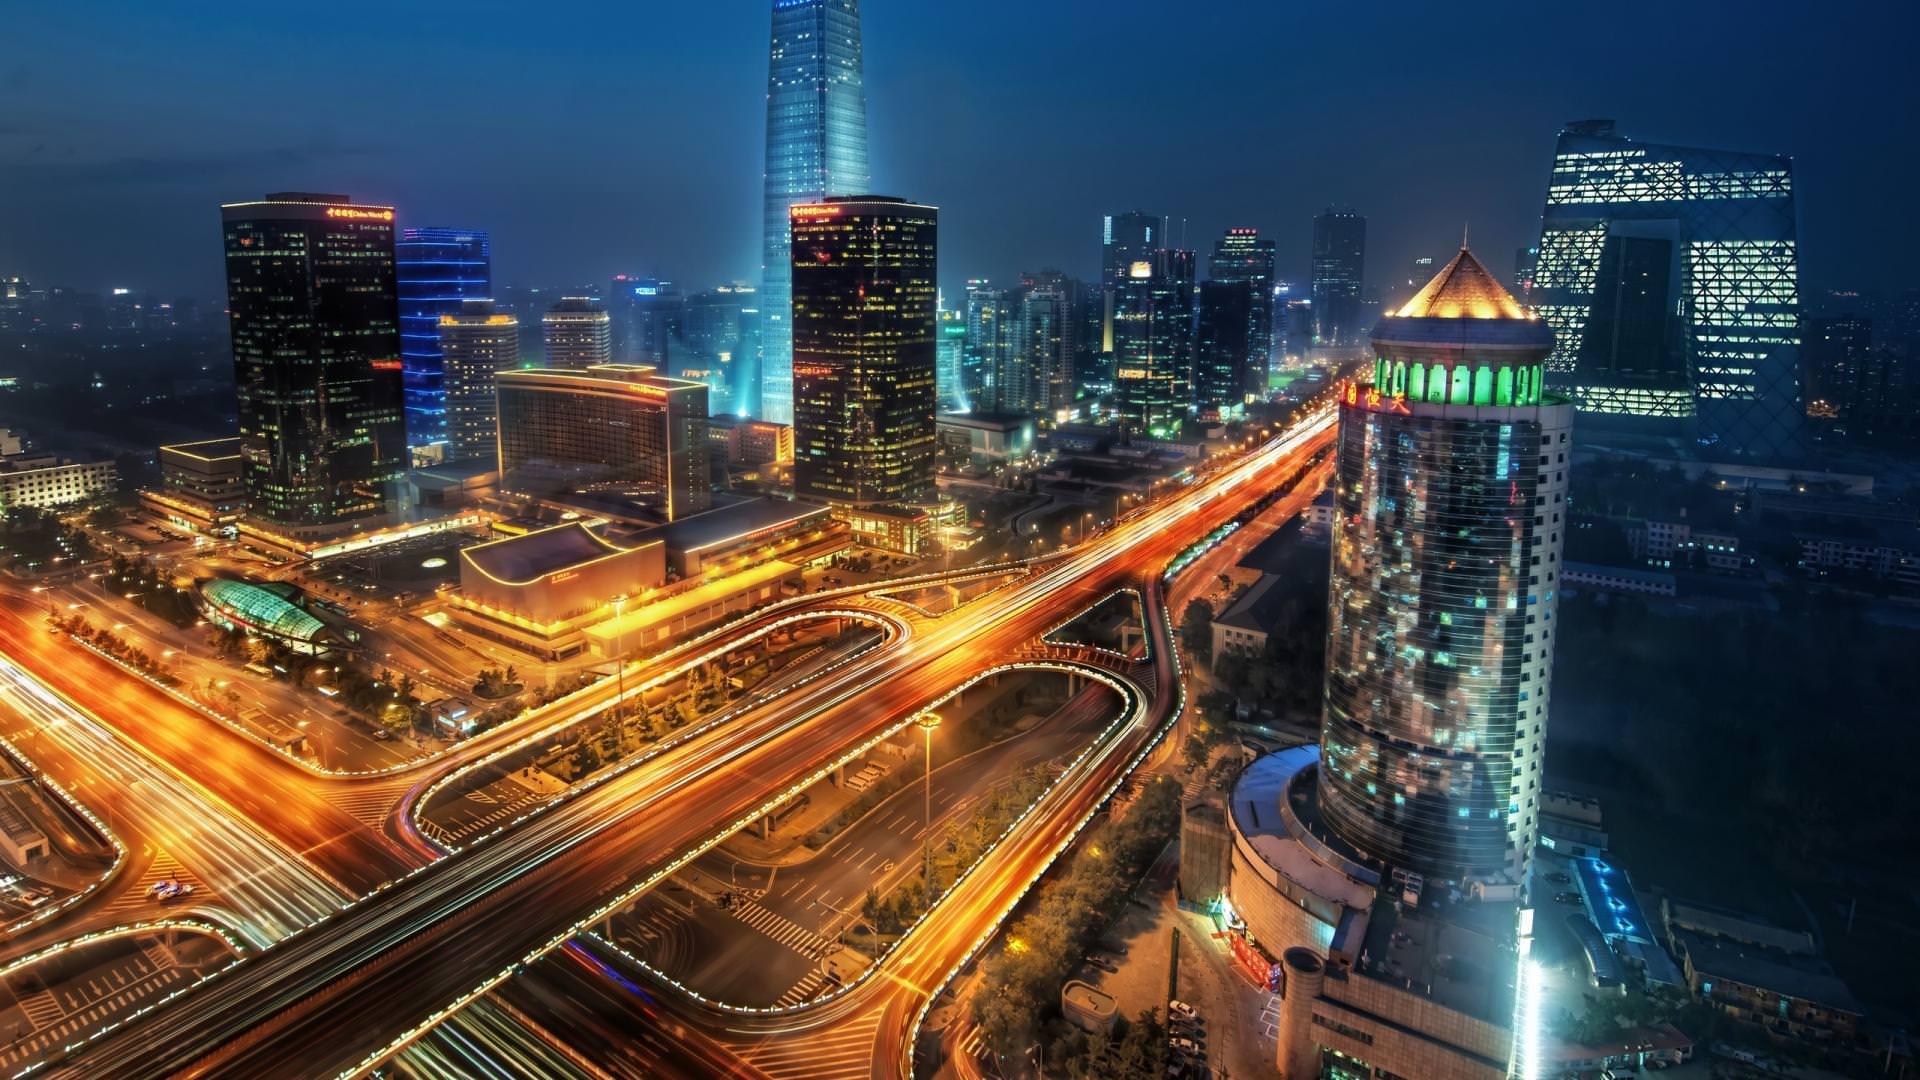 Beijing Night lights Wallpaper